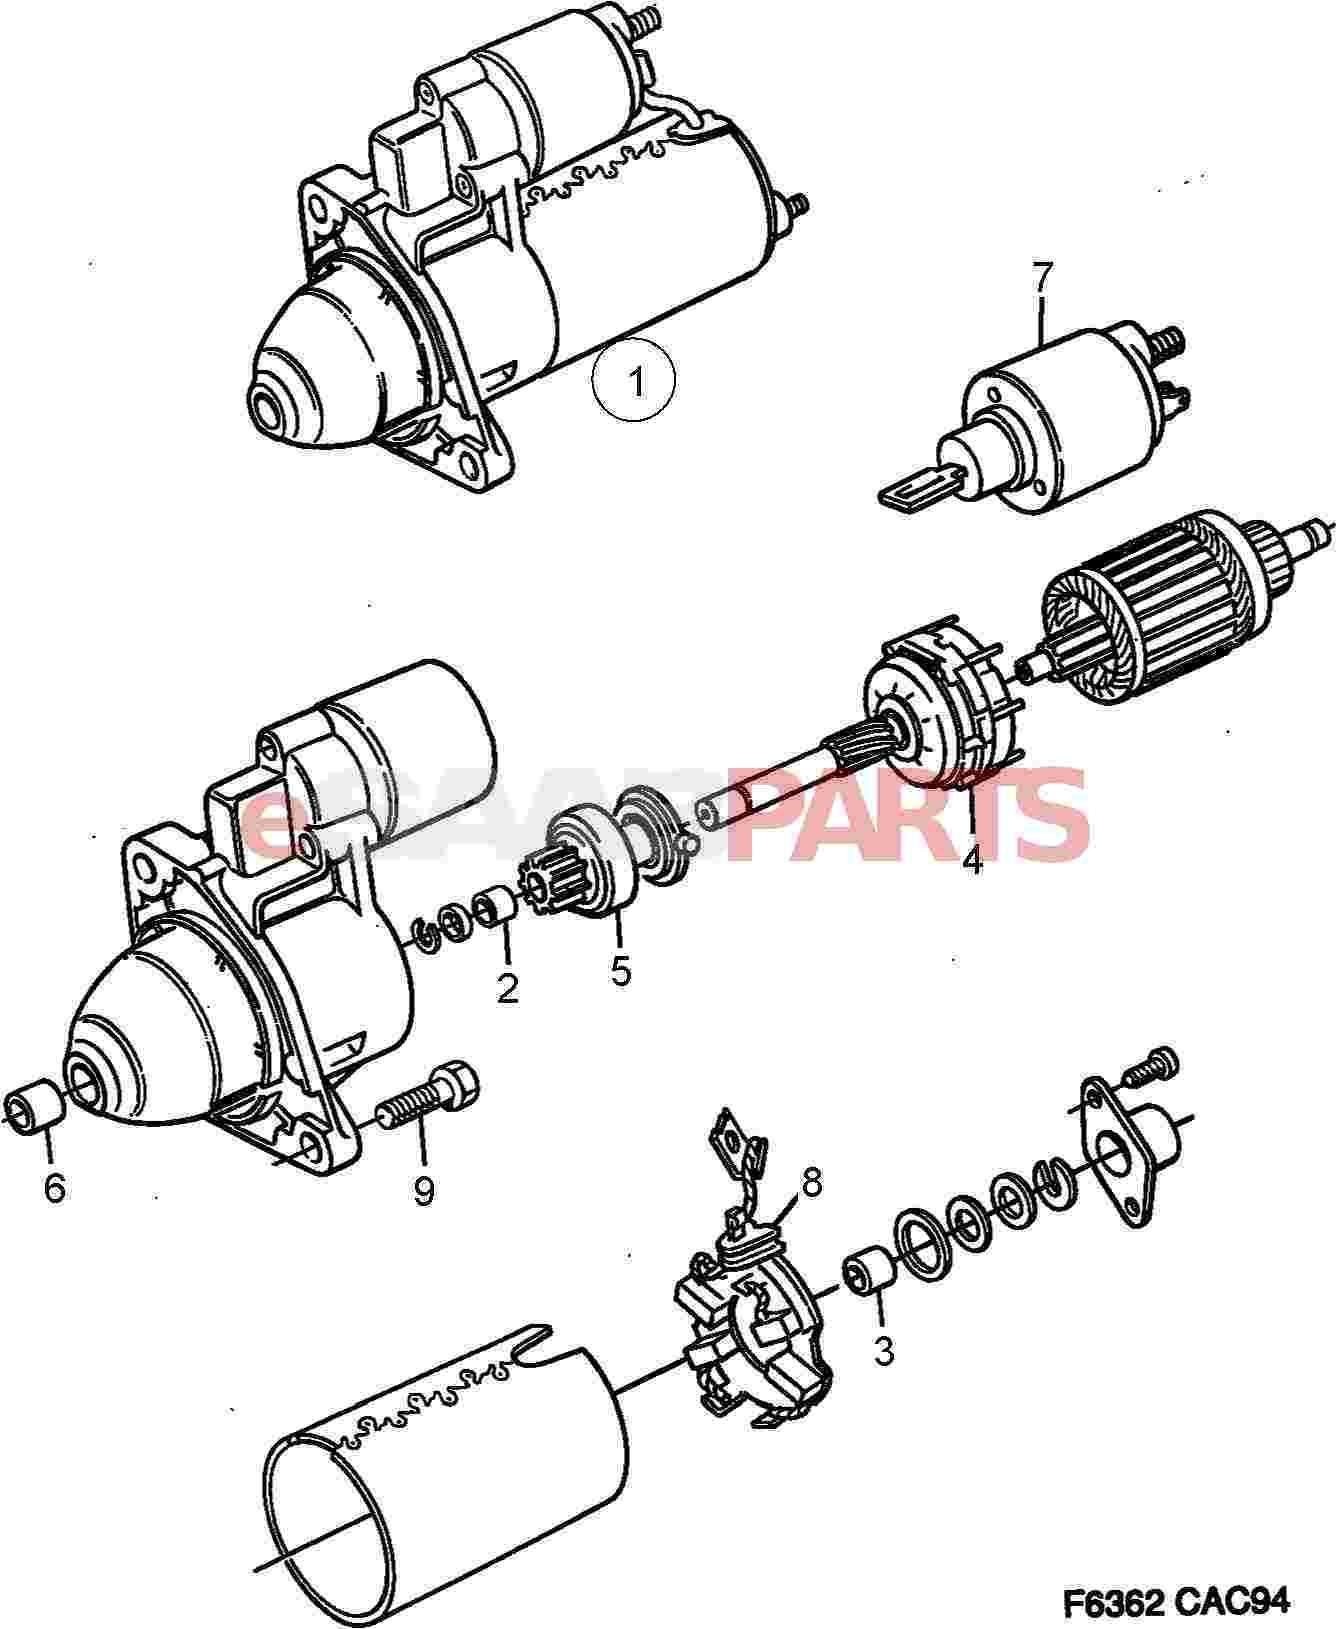 Saab Trionic Wiring Diagram Starter Motor 6 Cylinder